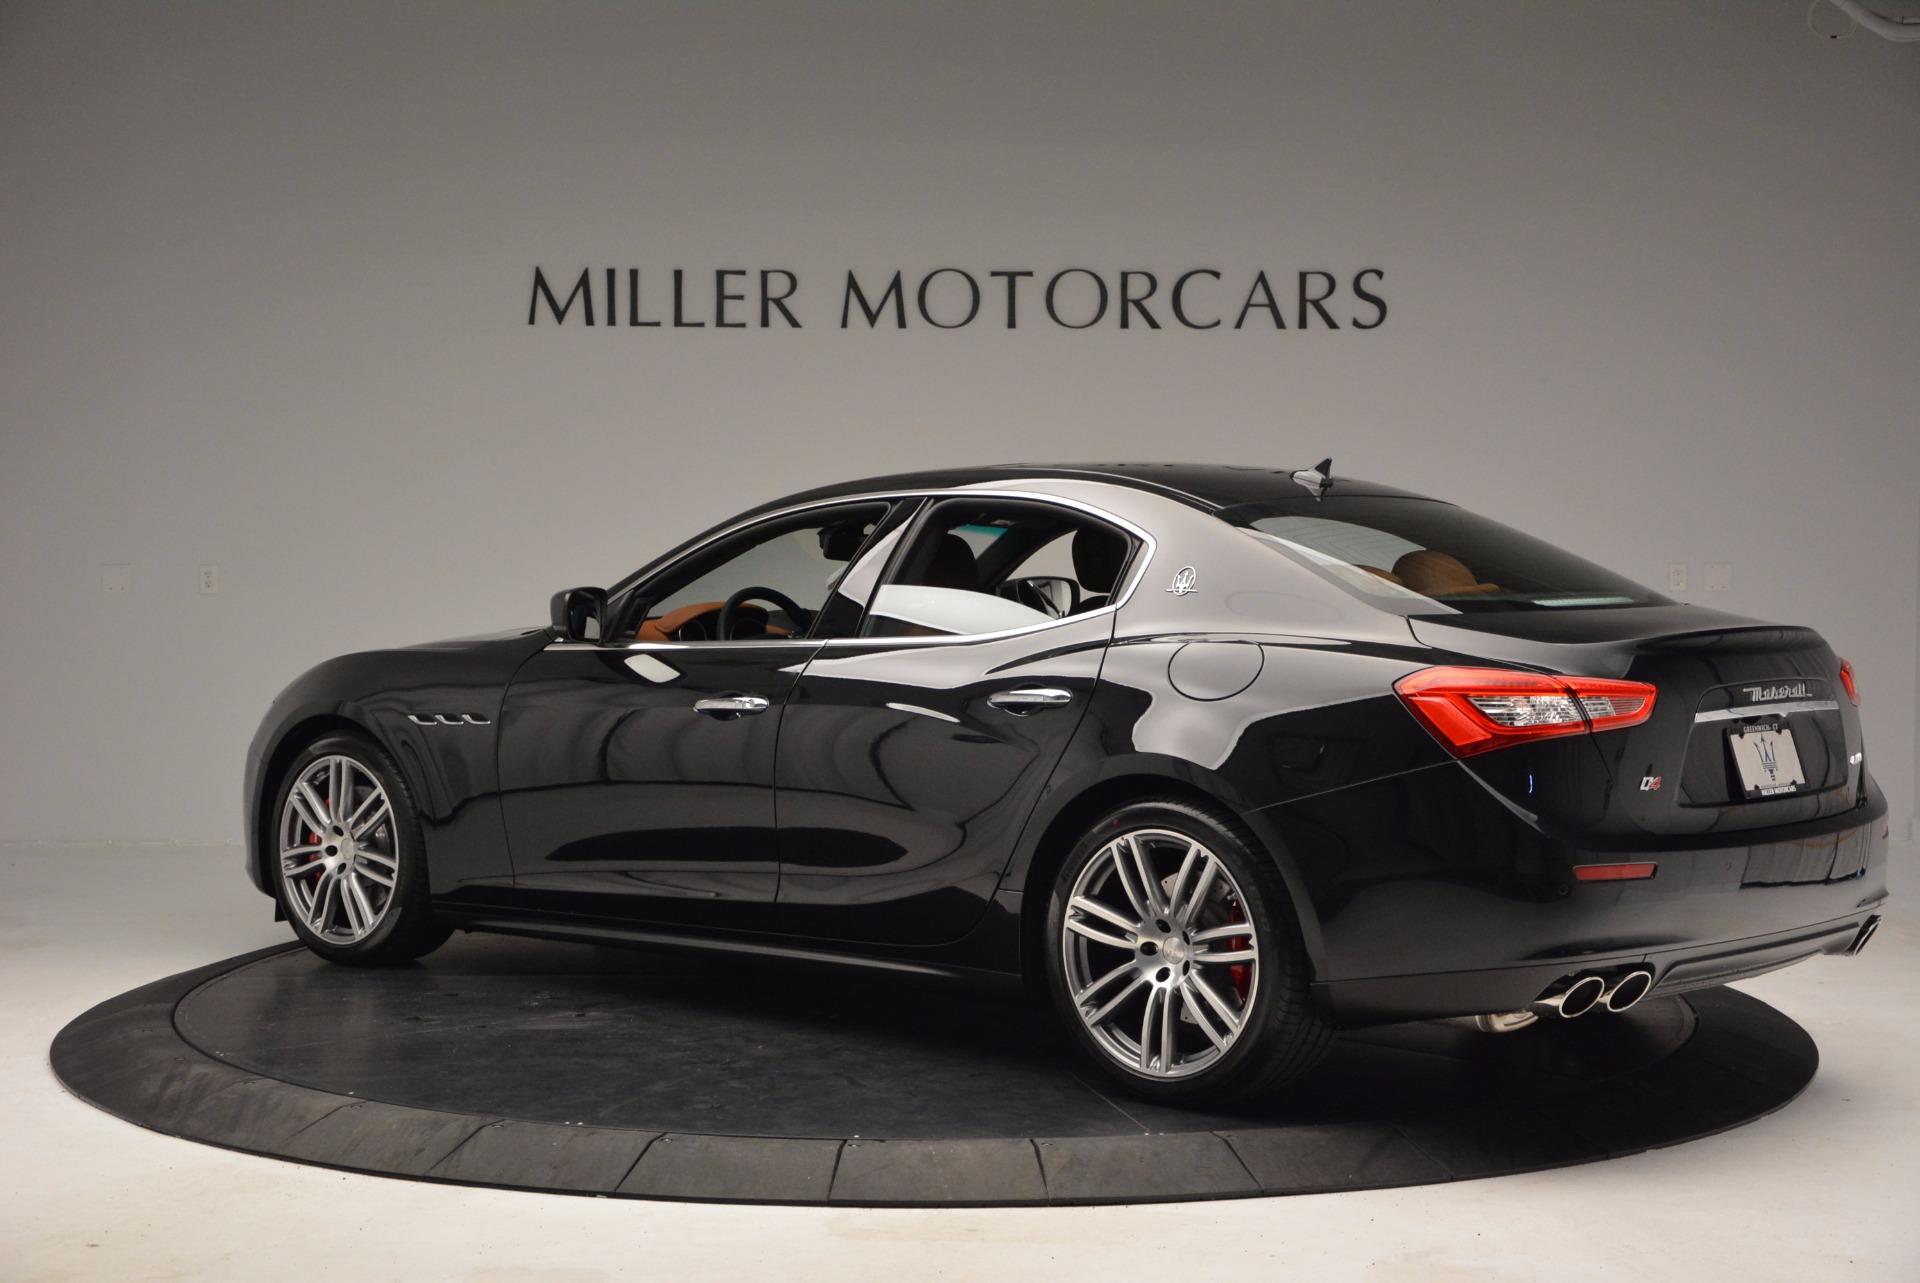 Used 2014 Maserati Ghibli S Q4 For Sale In Greenwich, CT. Alfa Romeo of Greenwich, 7281 1587_p4